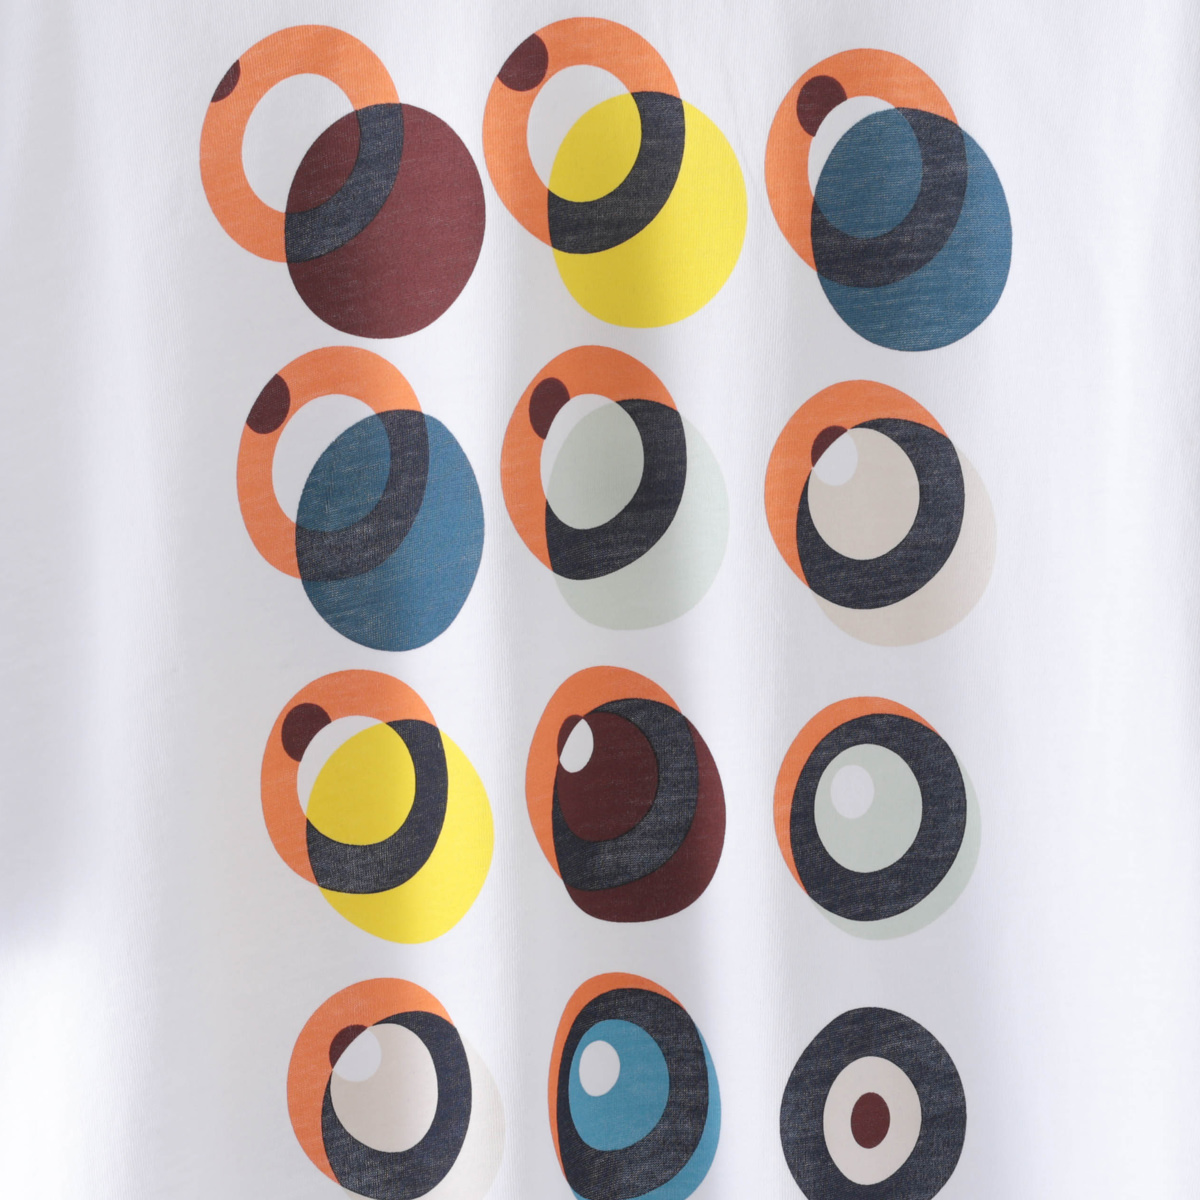 Tシャツ ターゲットグラフィックプリント 2色 マリン ホワイト オーガニックコットン レギュラーフィット Ben Sherman ベンシャーマン